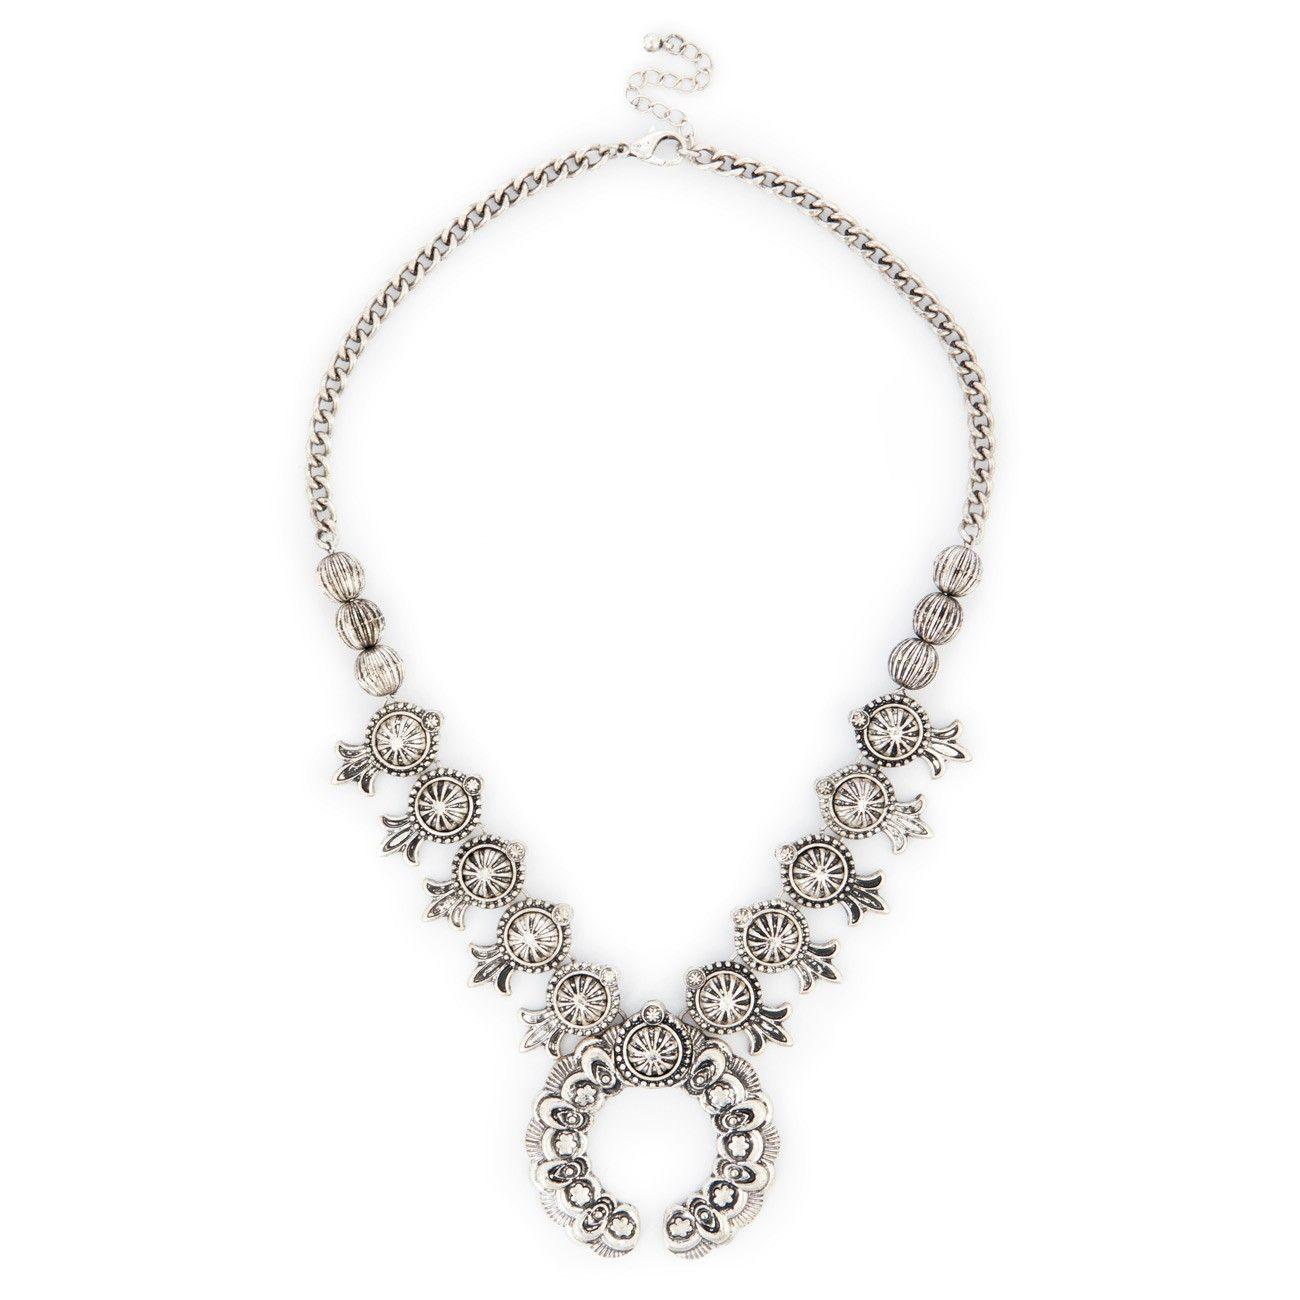 "Sole Society ""Squash Blossom Necklace"", $44.95"